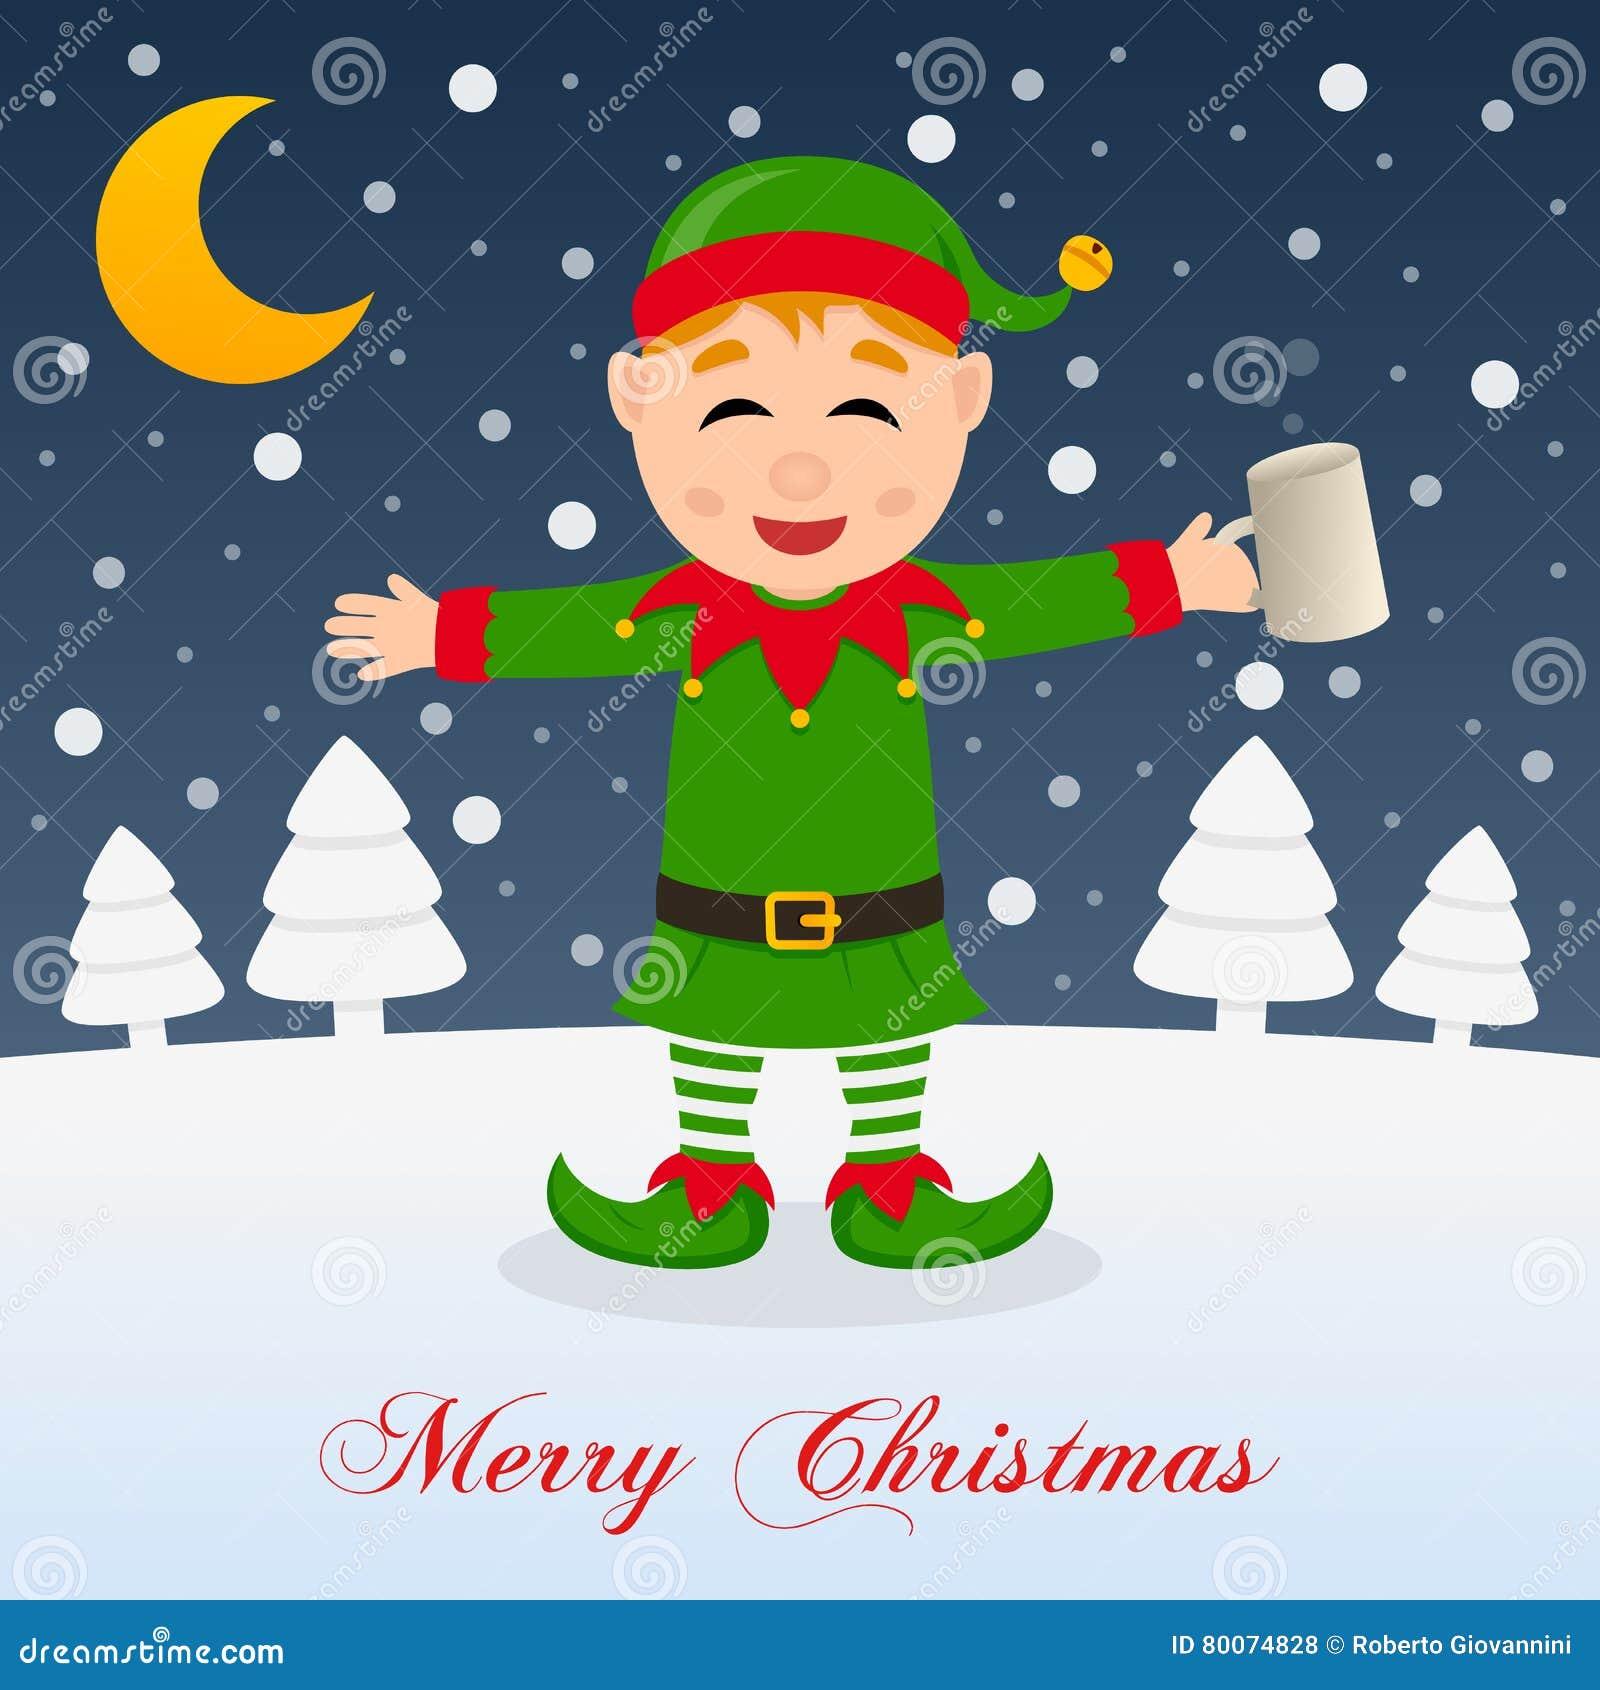 Christmas Night With Drunk Happy Green Elf Stock Vector